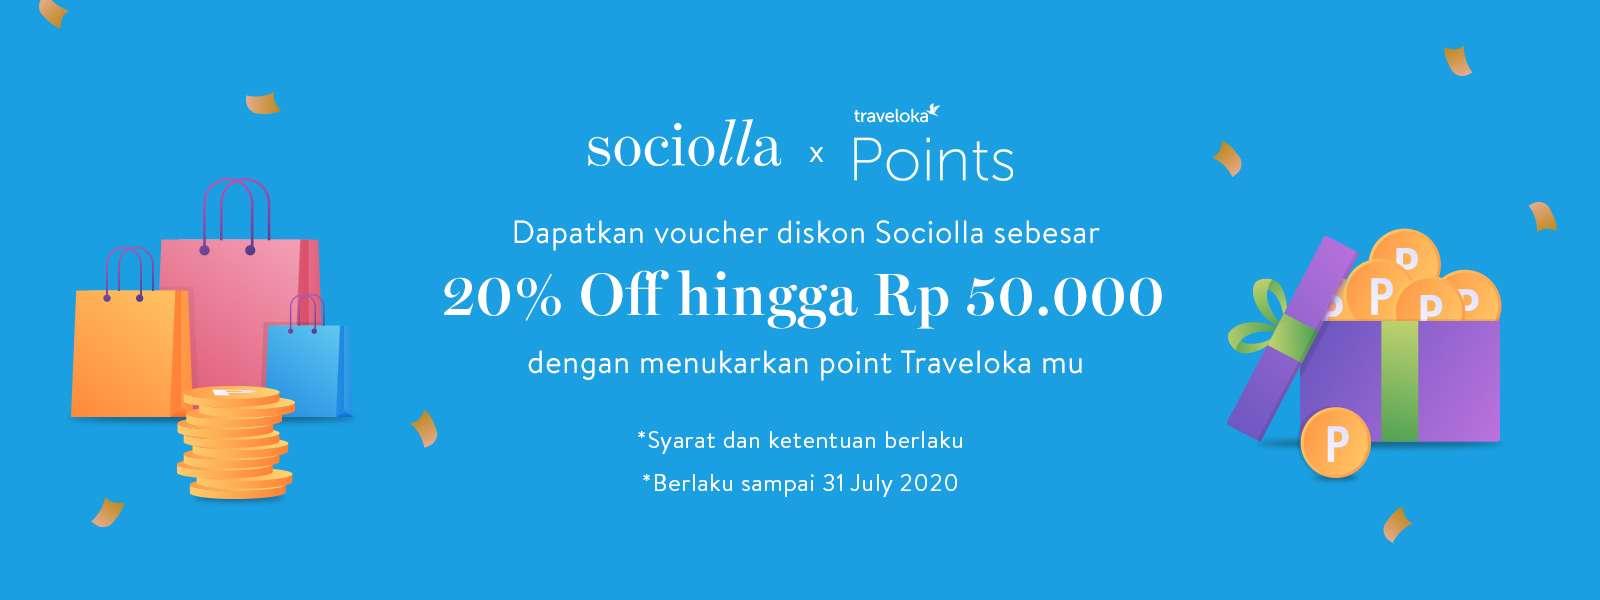 Sociolla Promo Voucher Diskon 20% Dengan Menukarkan Traveloka Point